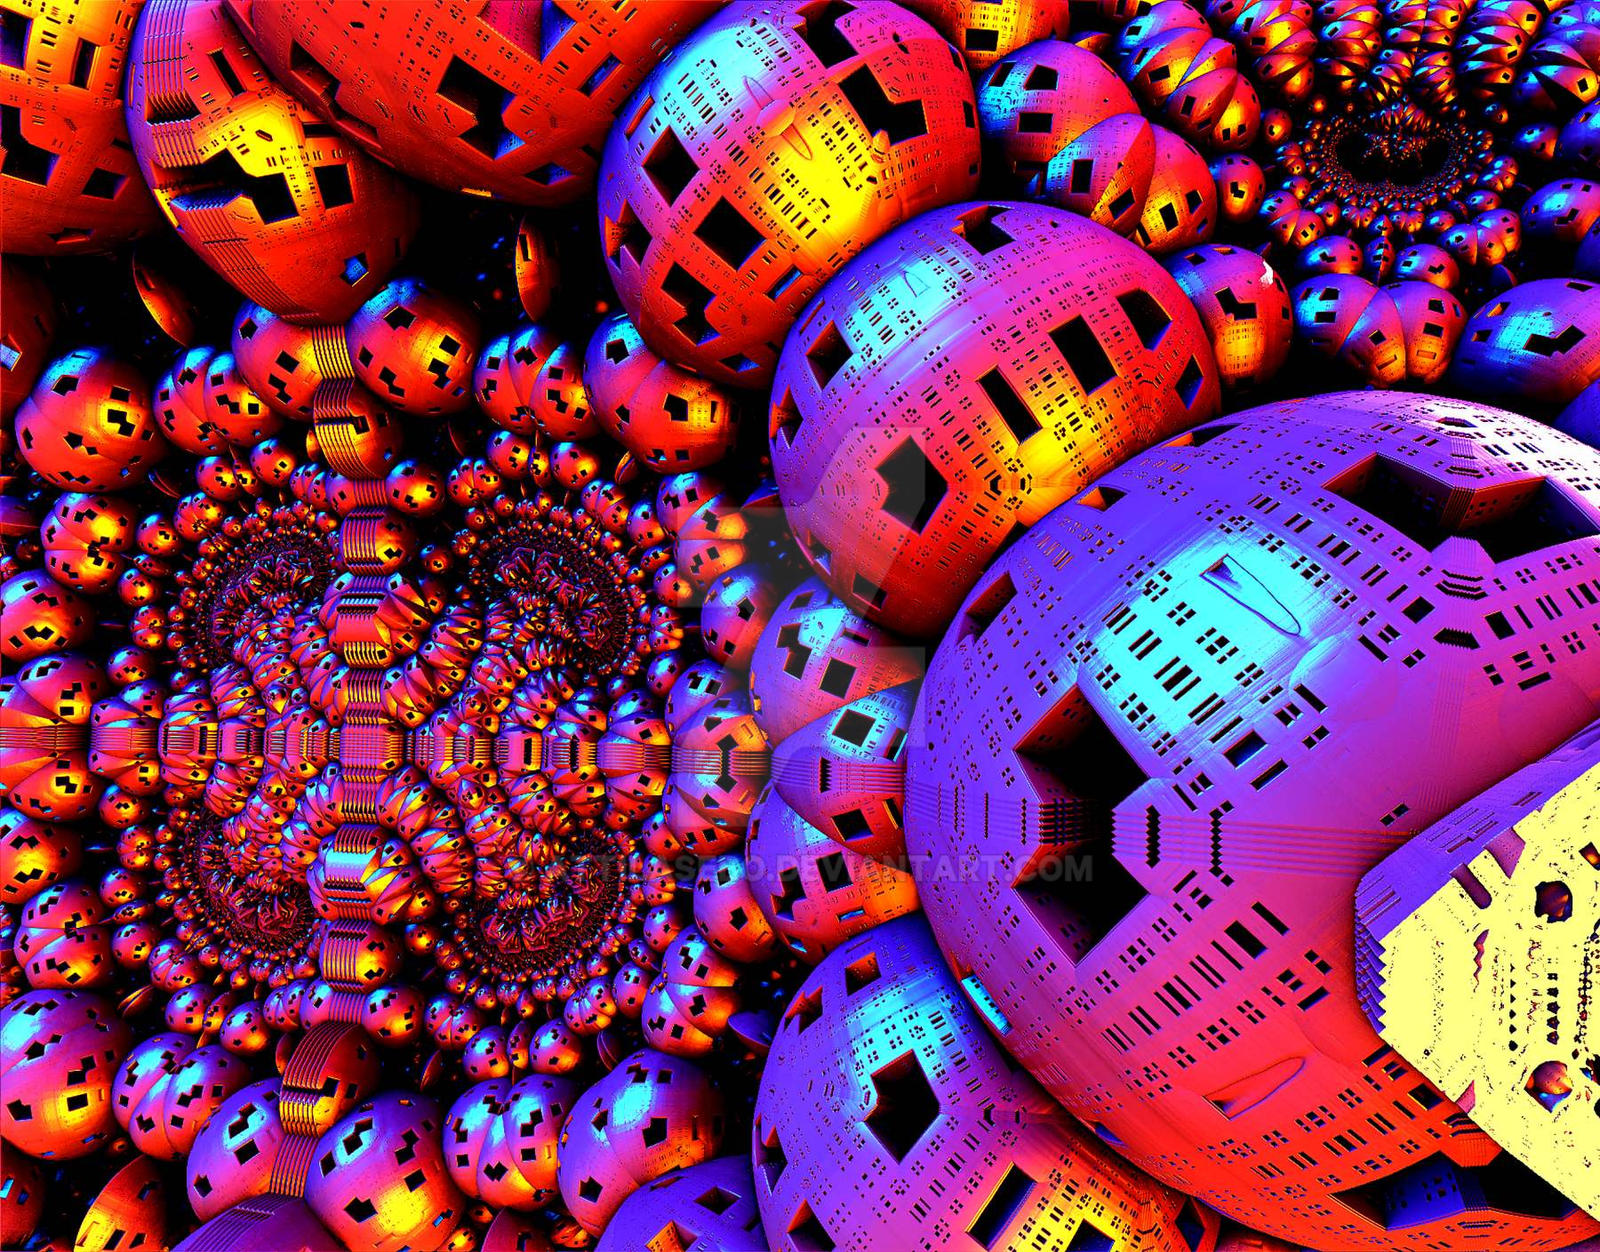 Neon Balls by attilasebo